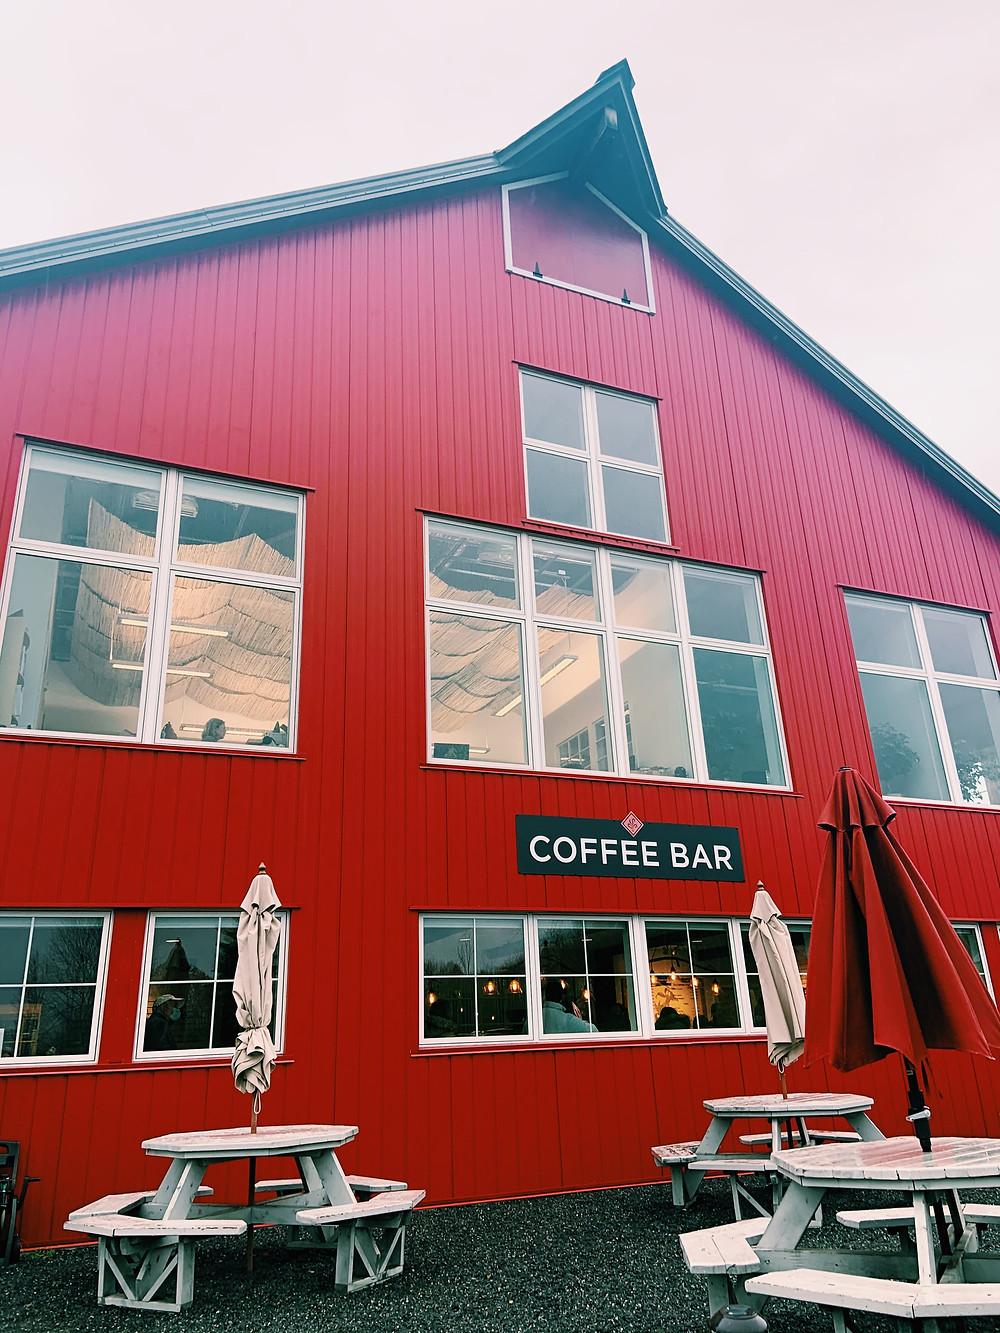 Vermont Coffee & Tea in Waterbury, VT